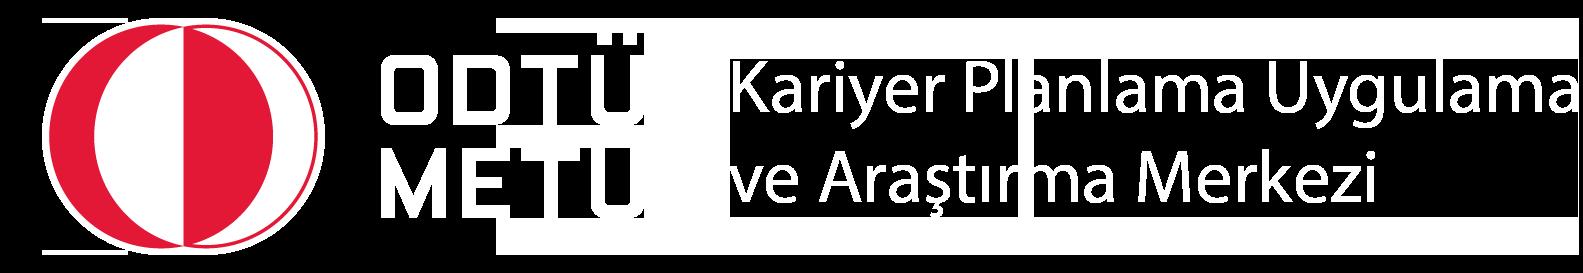 ODTÜ KPM